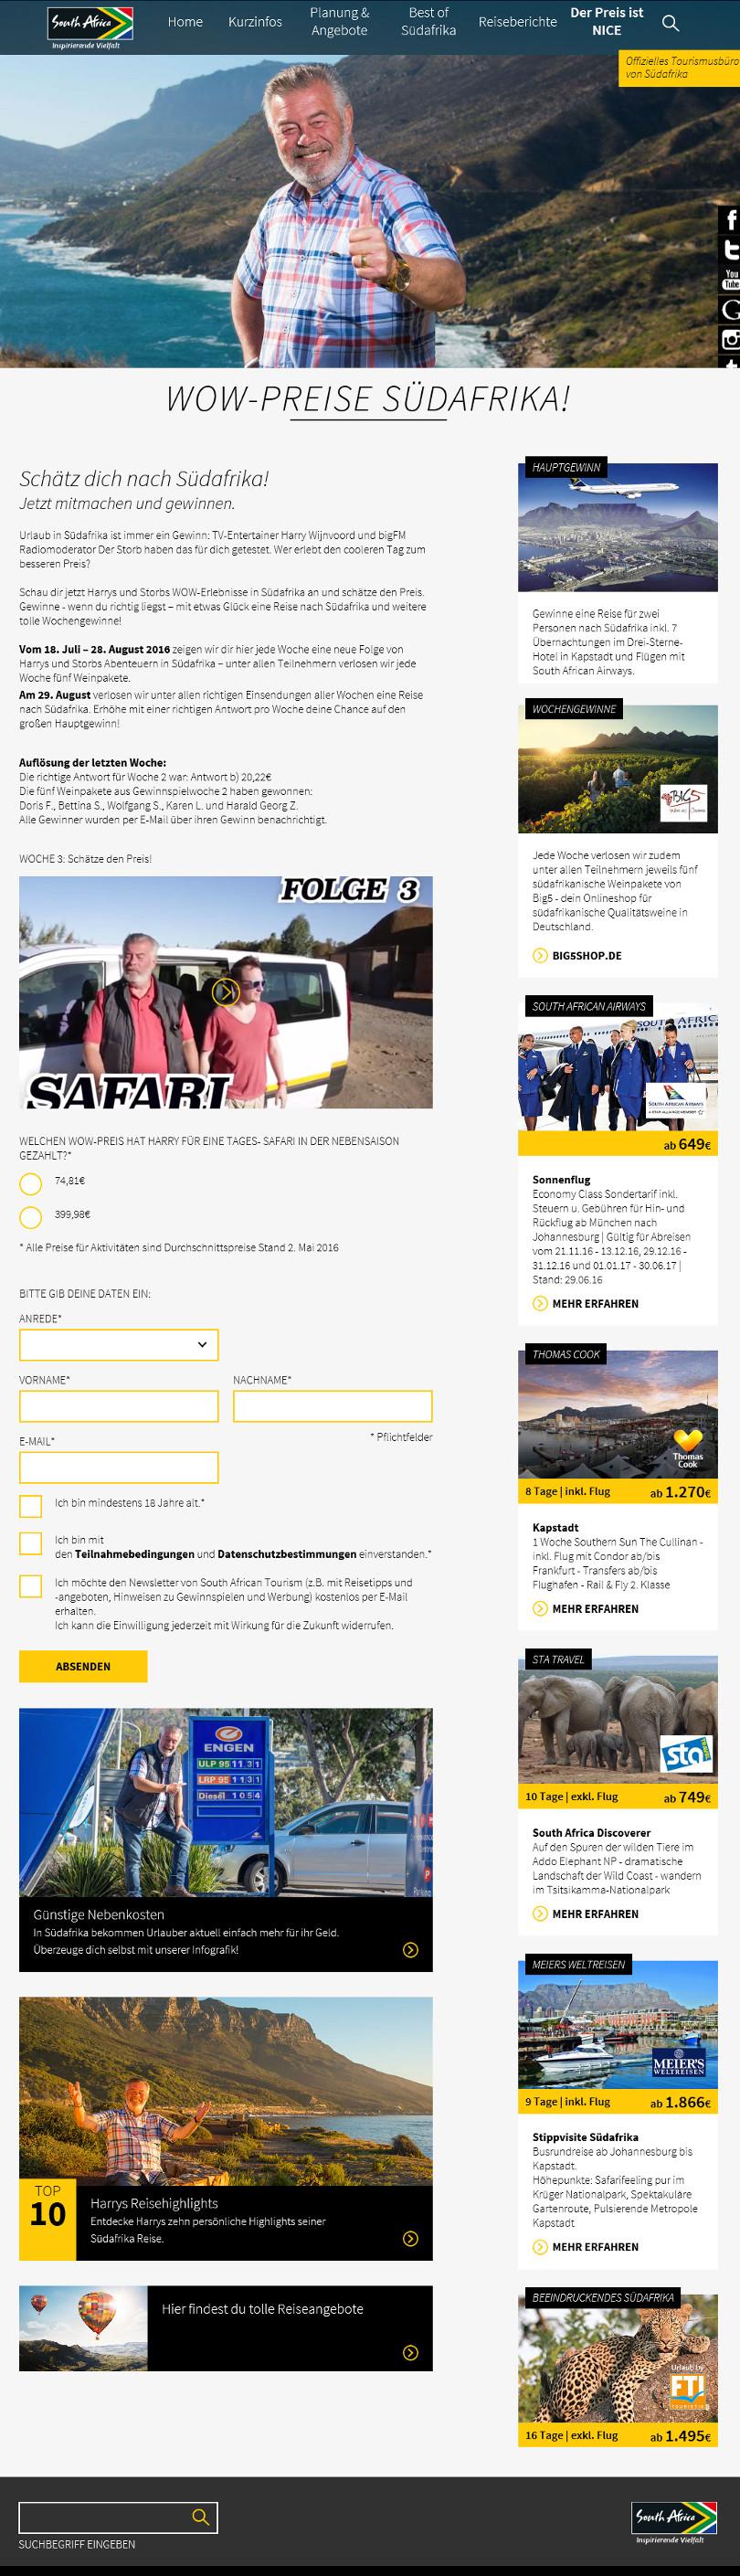 Harry Wijnvoord – WOW-Preise Südafrika!